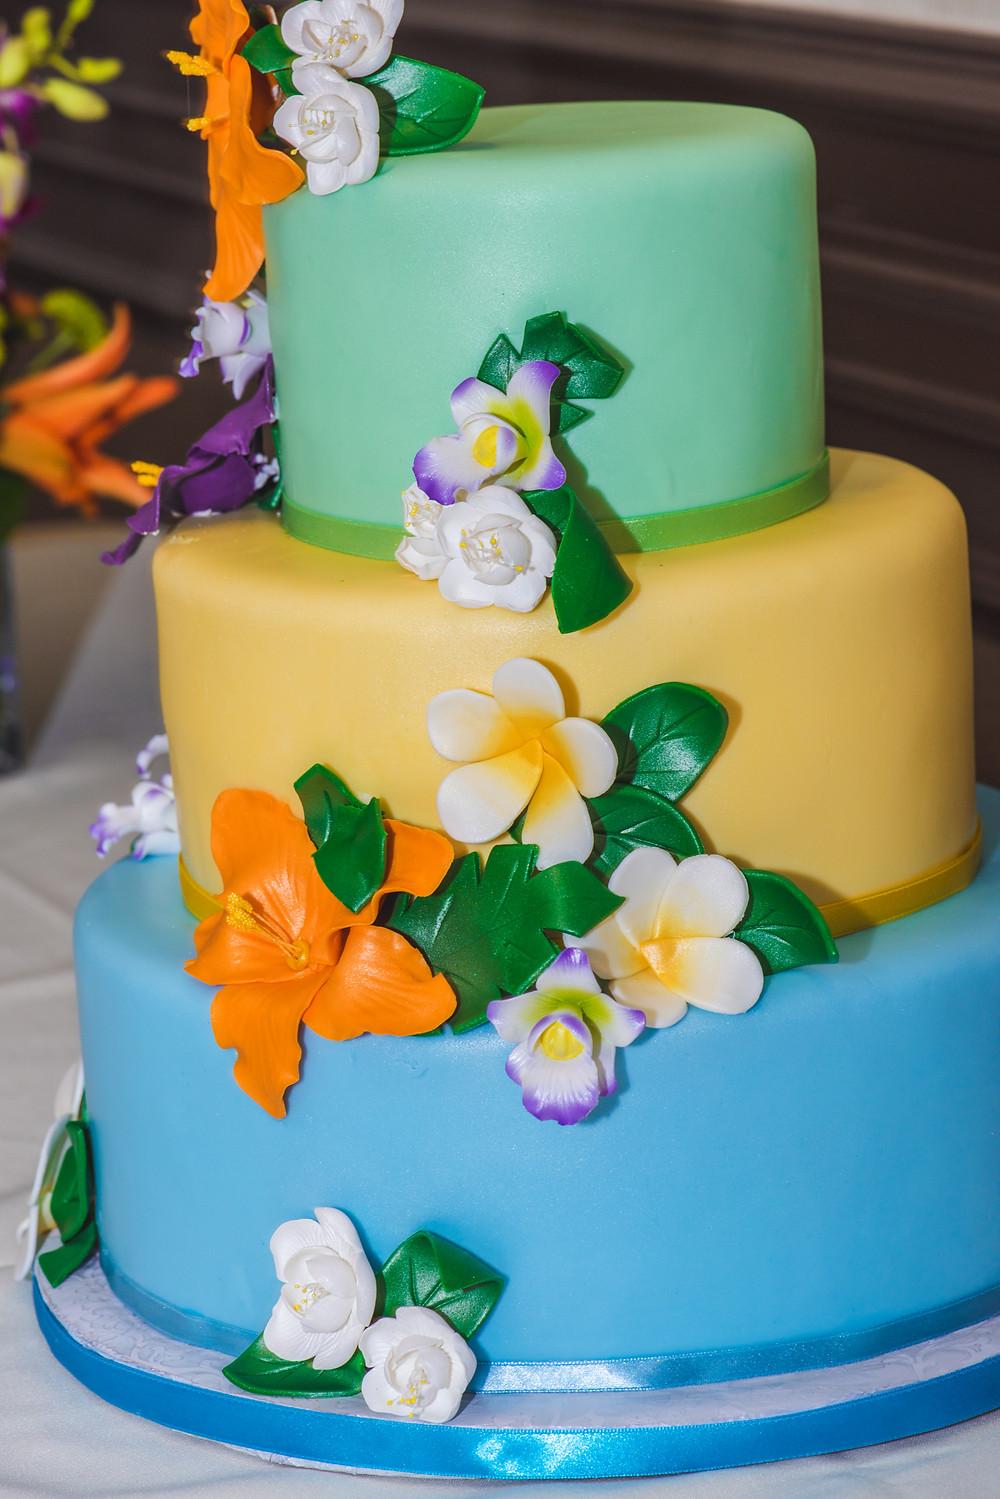 Wedding Cake, Event photography, Birthday photography. Sweet 16 photography, Baptism photography, Quinceañera photography, Bar Mitzvah photography, Bat Mitzvah Photography, Events, Anniversary, 50th Anniversary